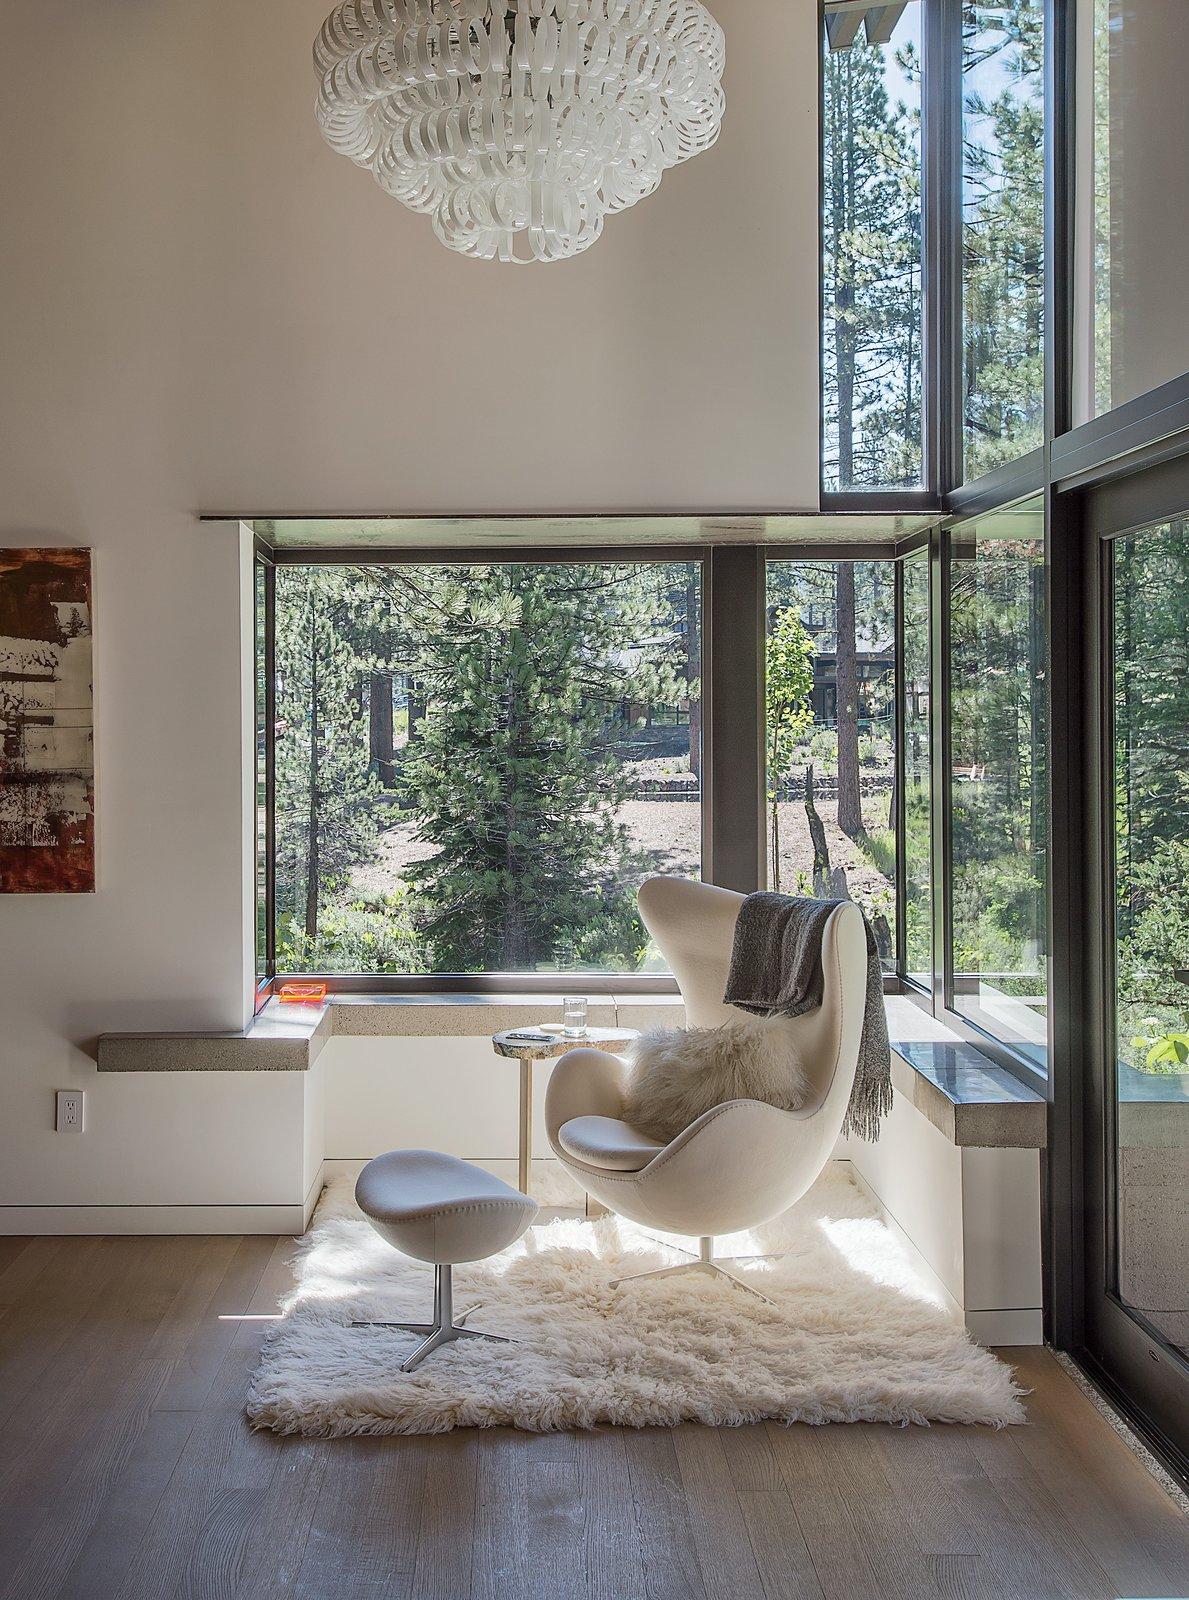 #interior #modern #inside #design #interiordesign #eggchair #flokati #flokatirug #rug #windows #chandelier #forest #concrete #wallart #sidetable #naturallighting #seatingdesign #seating  100+ Best Modern Seating Designs by Dwell